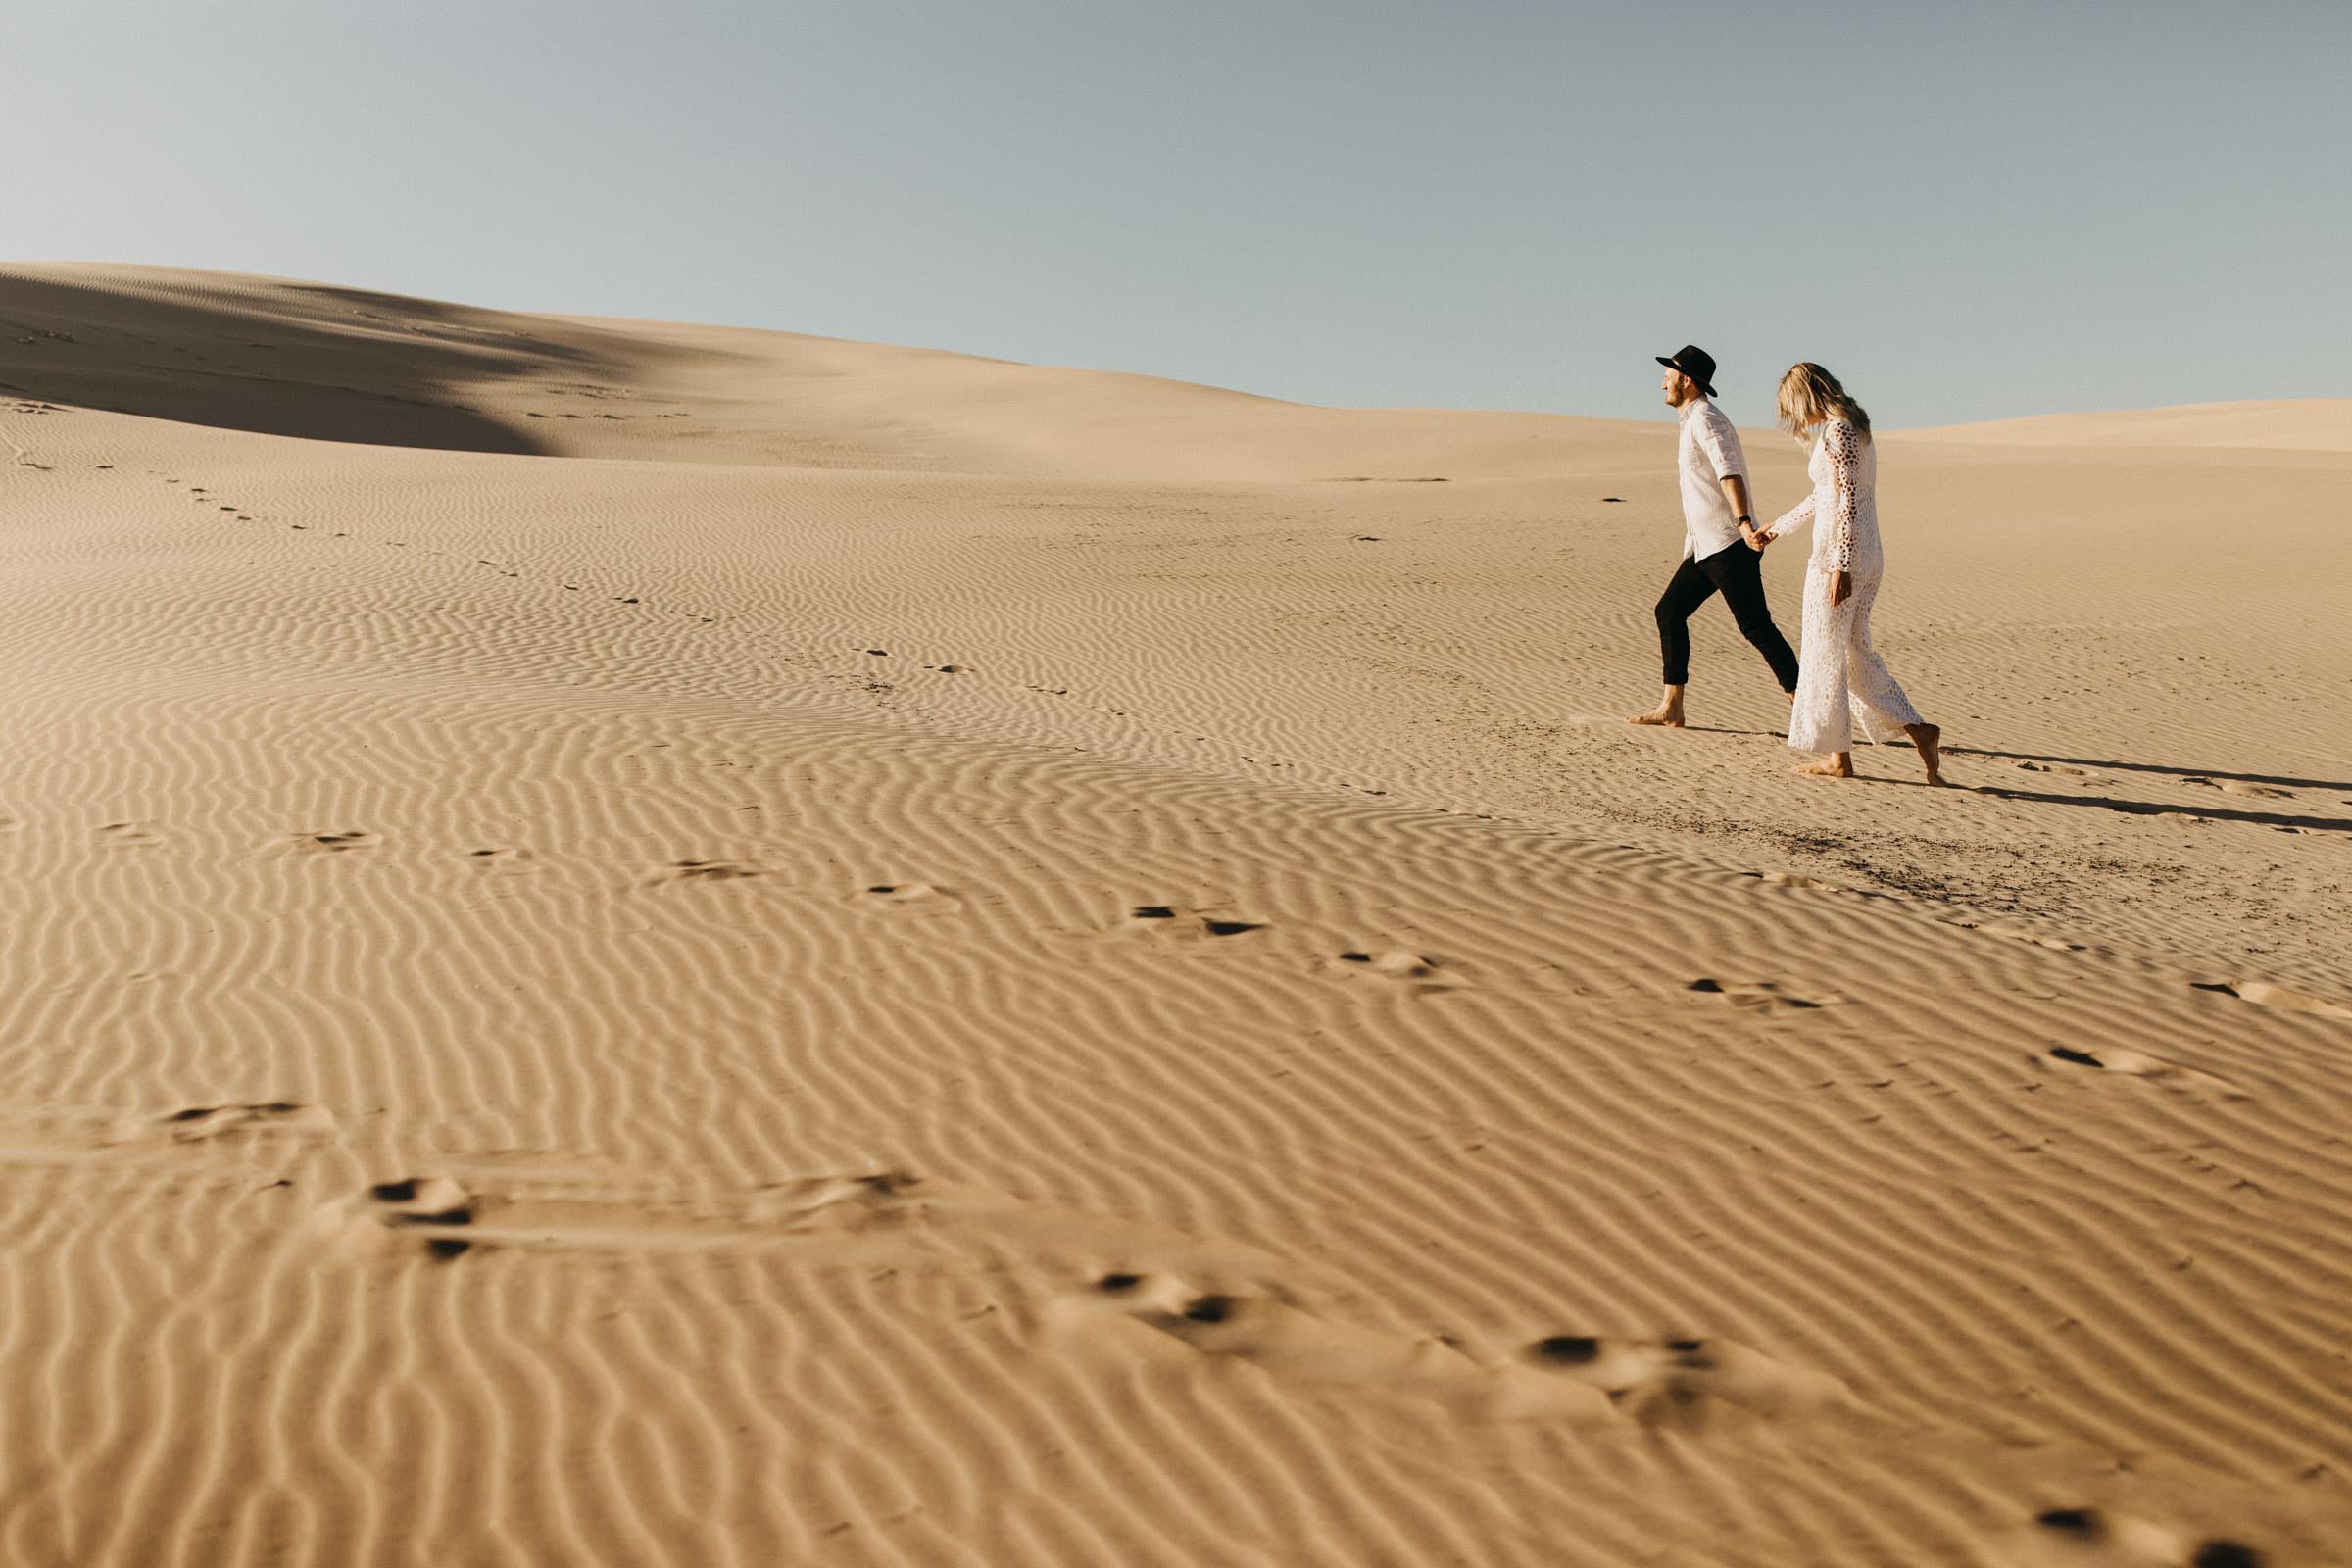 Stockon-sand-dunes-shoot-1-1-1.jpg